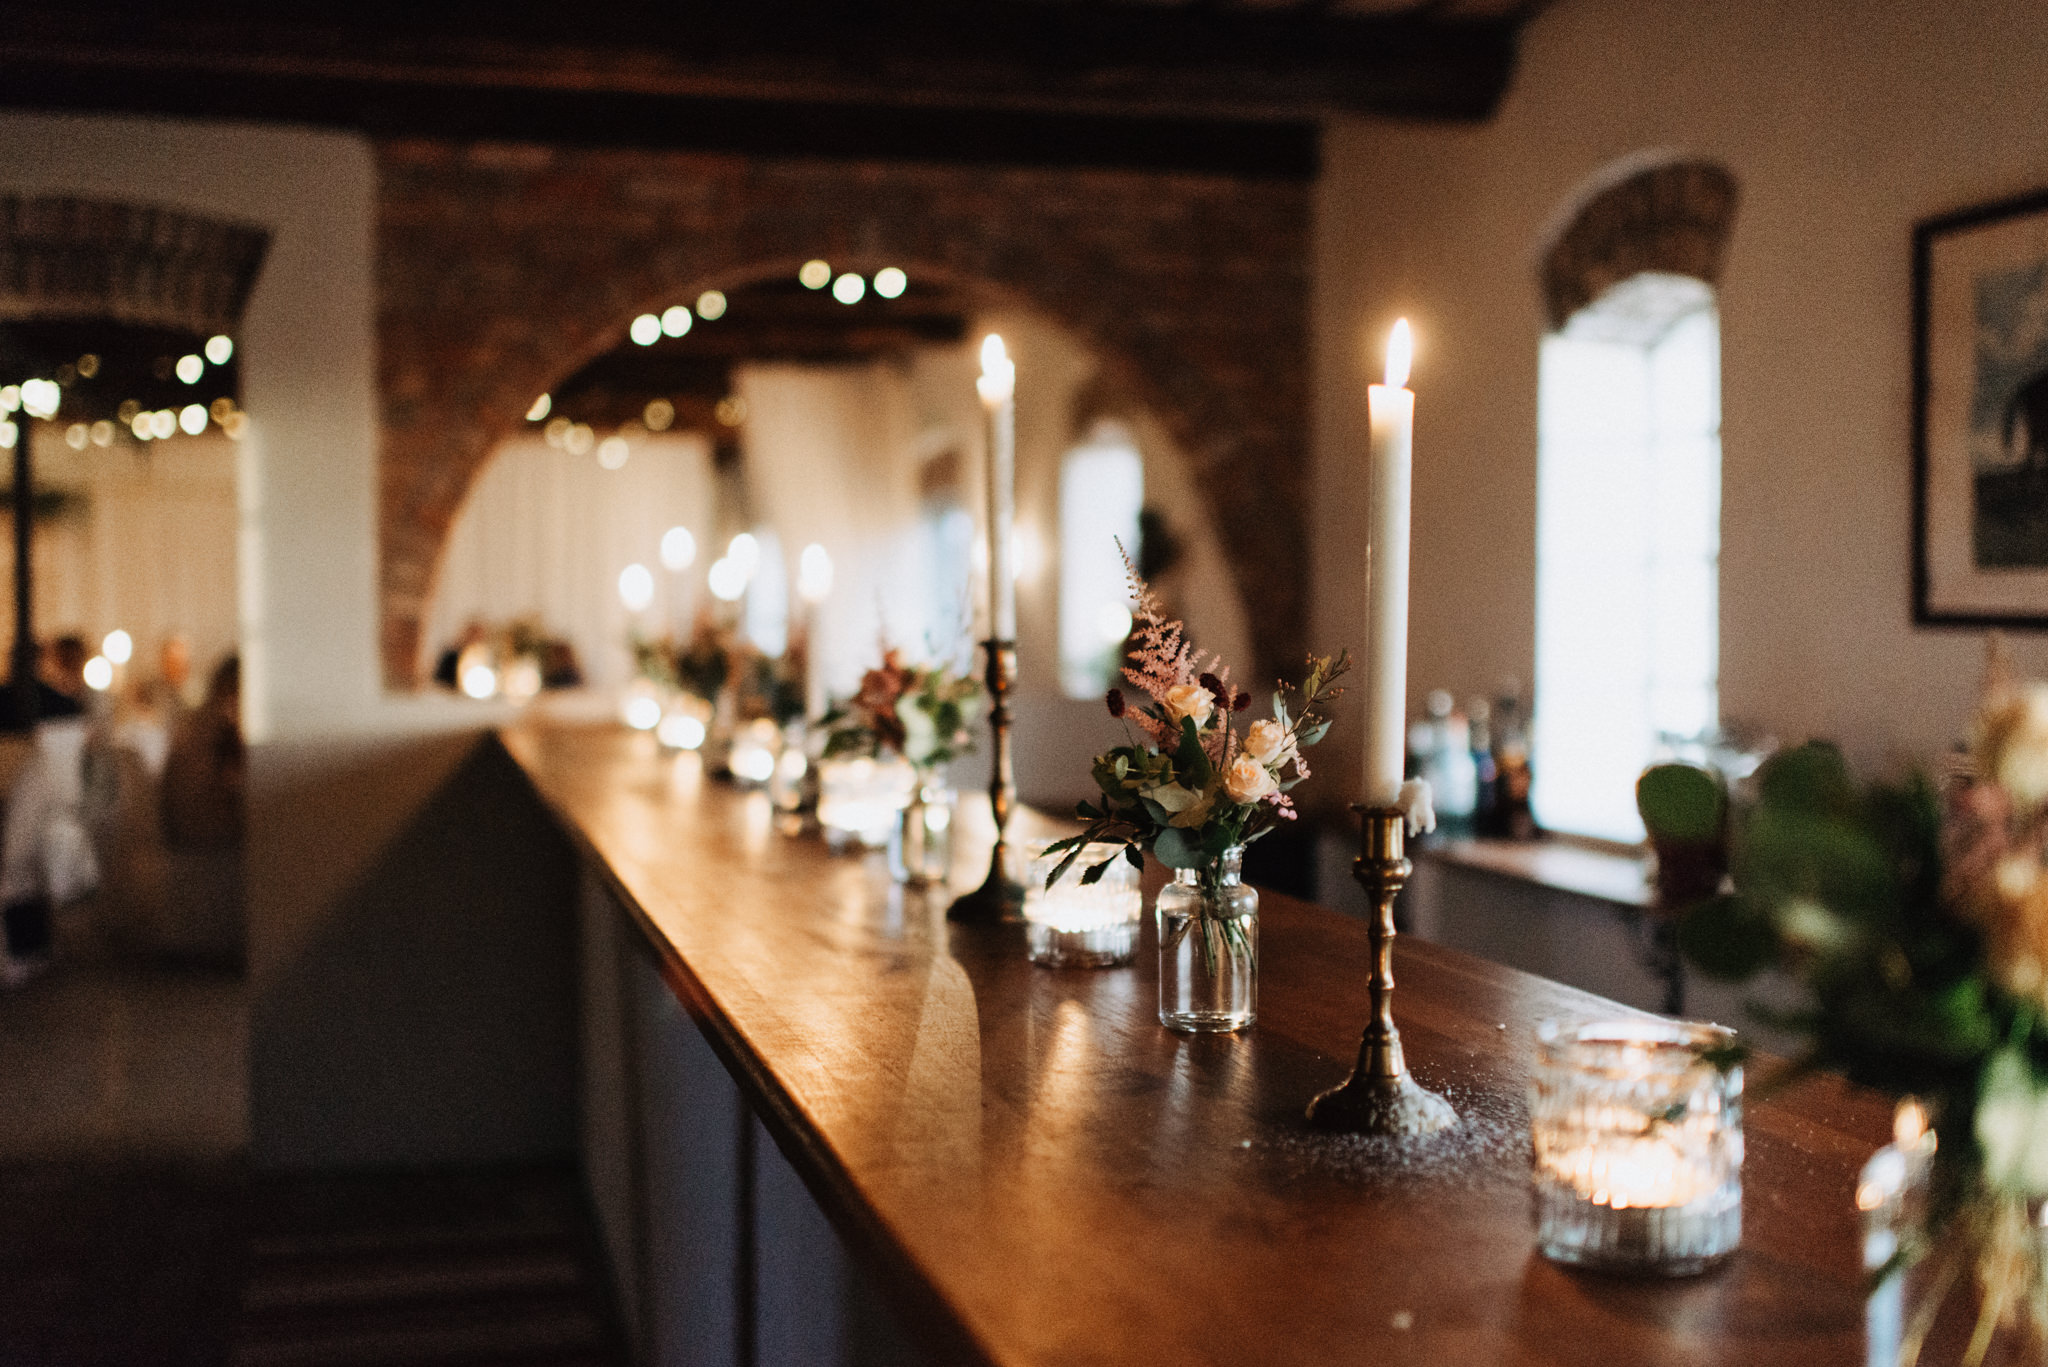 bohemiskt-bröllop-på-nygård-event-i-åstorp-bröllopsfotograf-skåne-190.jpg